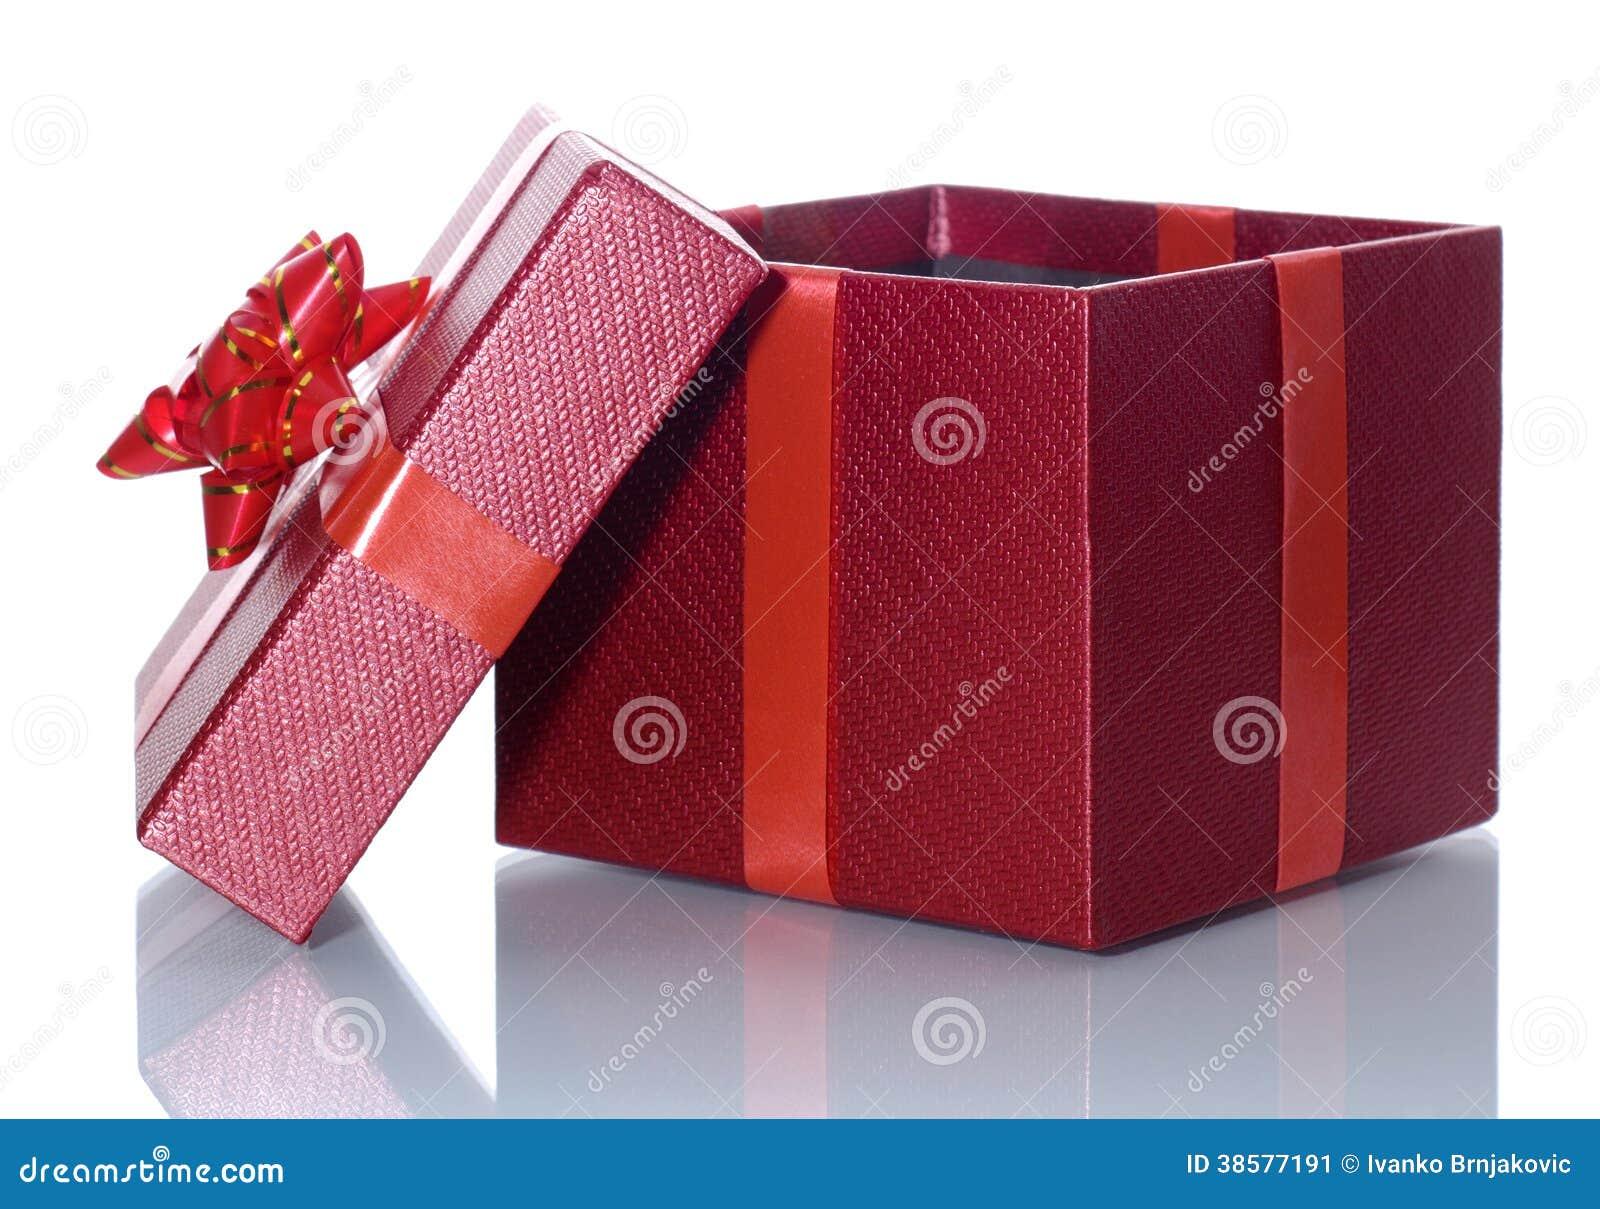 open gift box stock image image 38577191. Black Bedroom Furniture Sets. Home Design Ideas